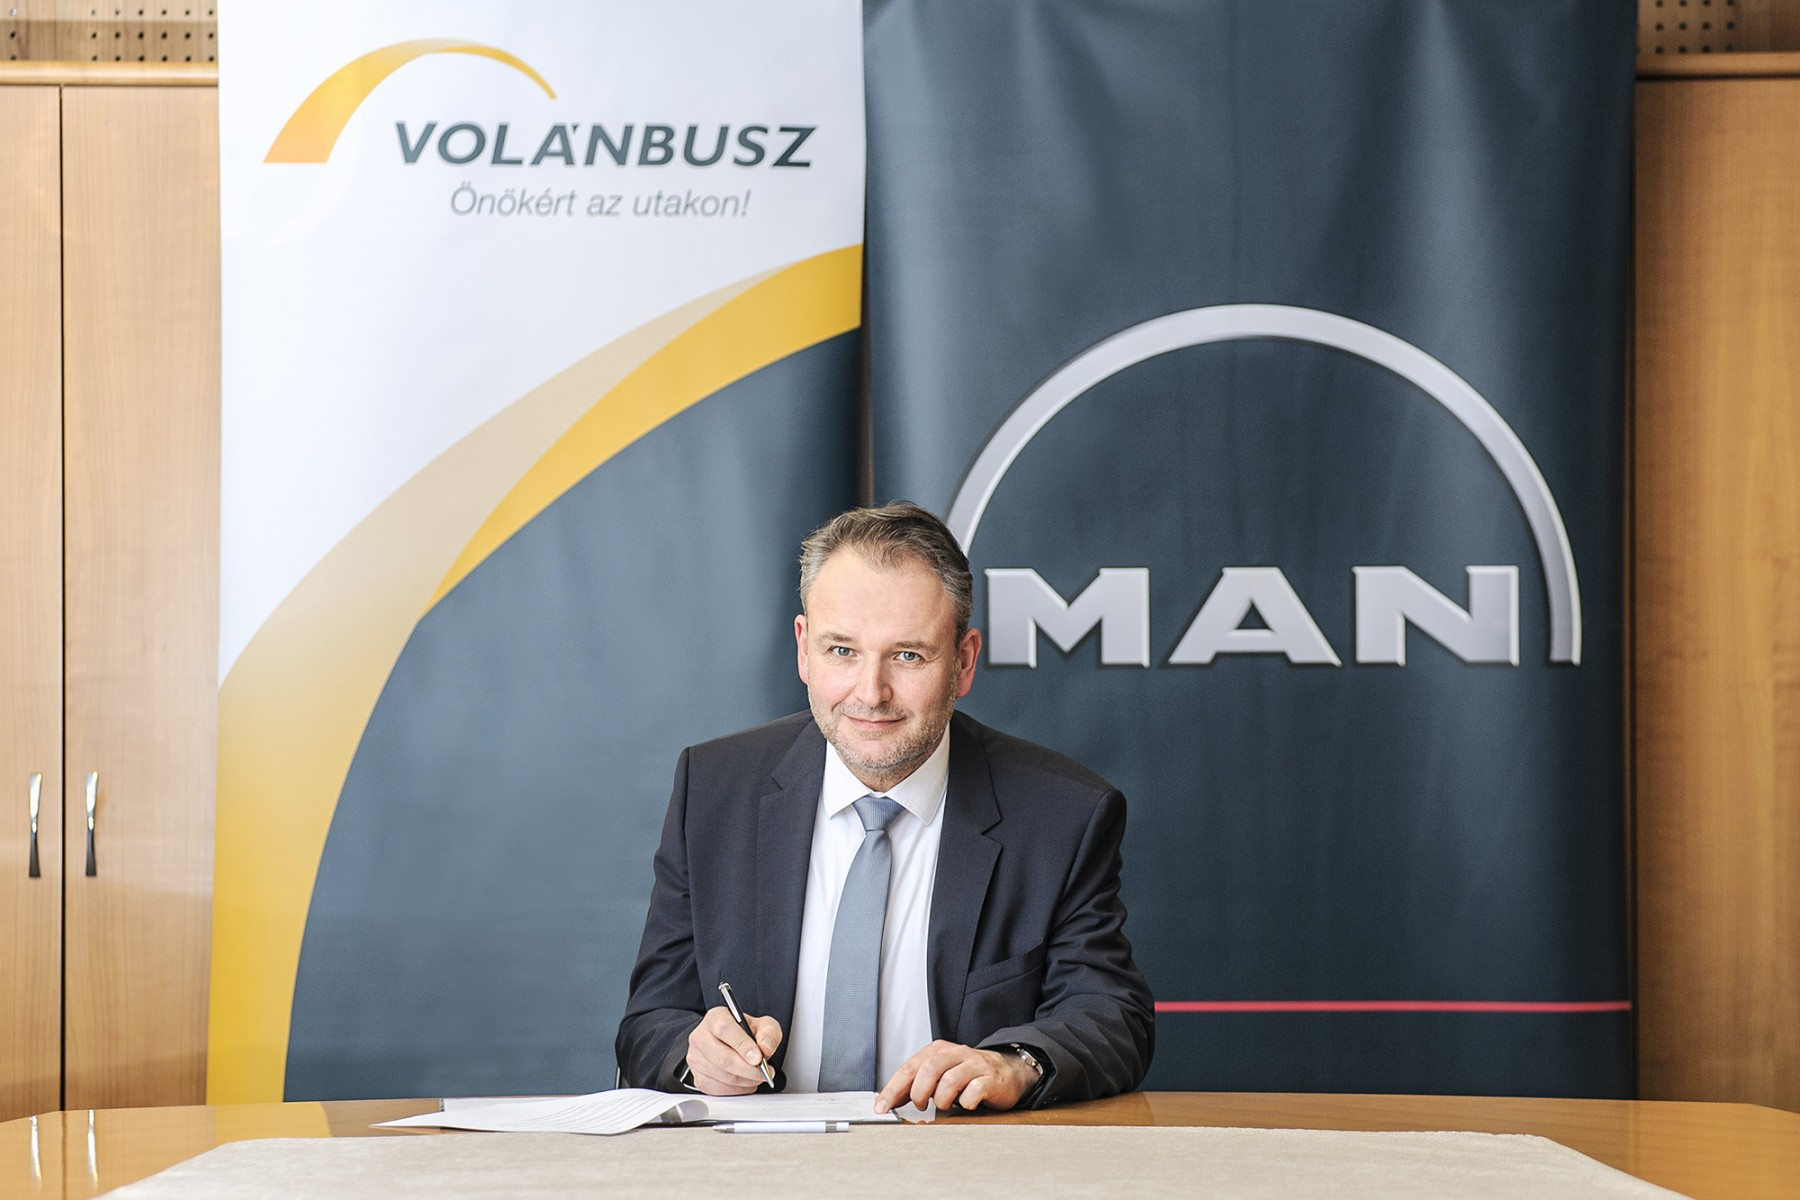 Volánbusz Man City bus Hungary